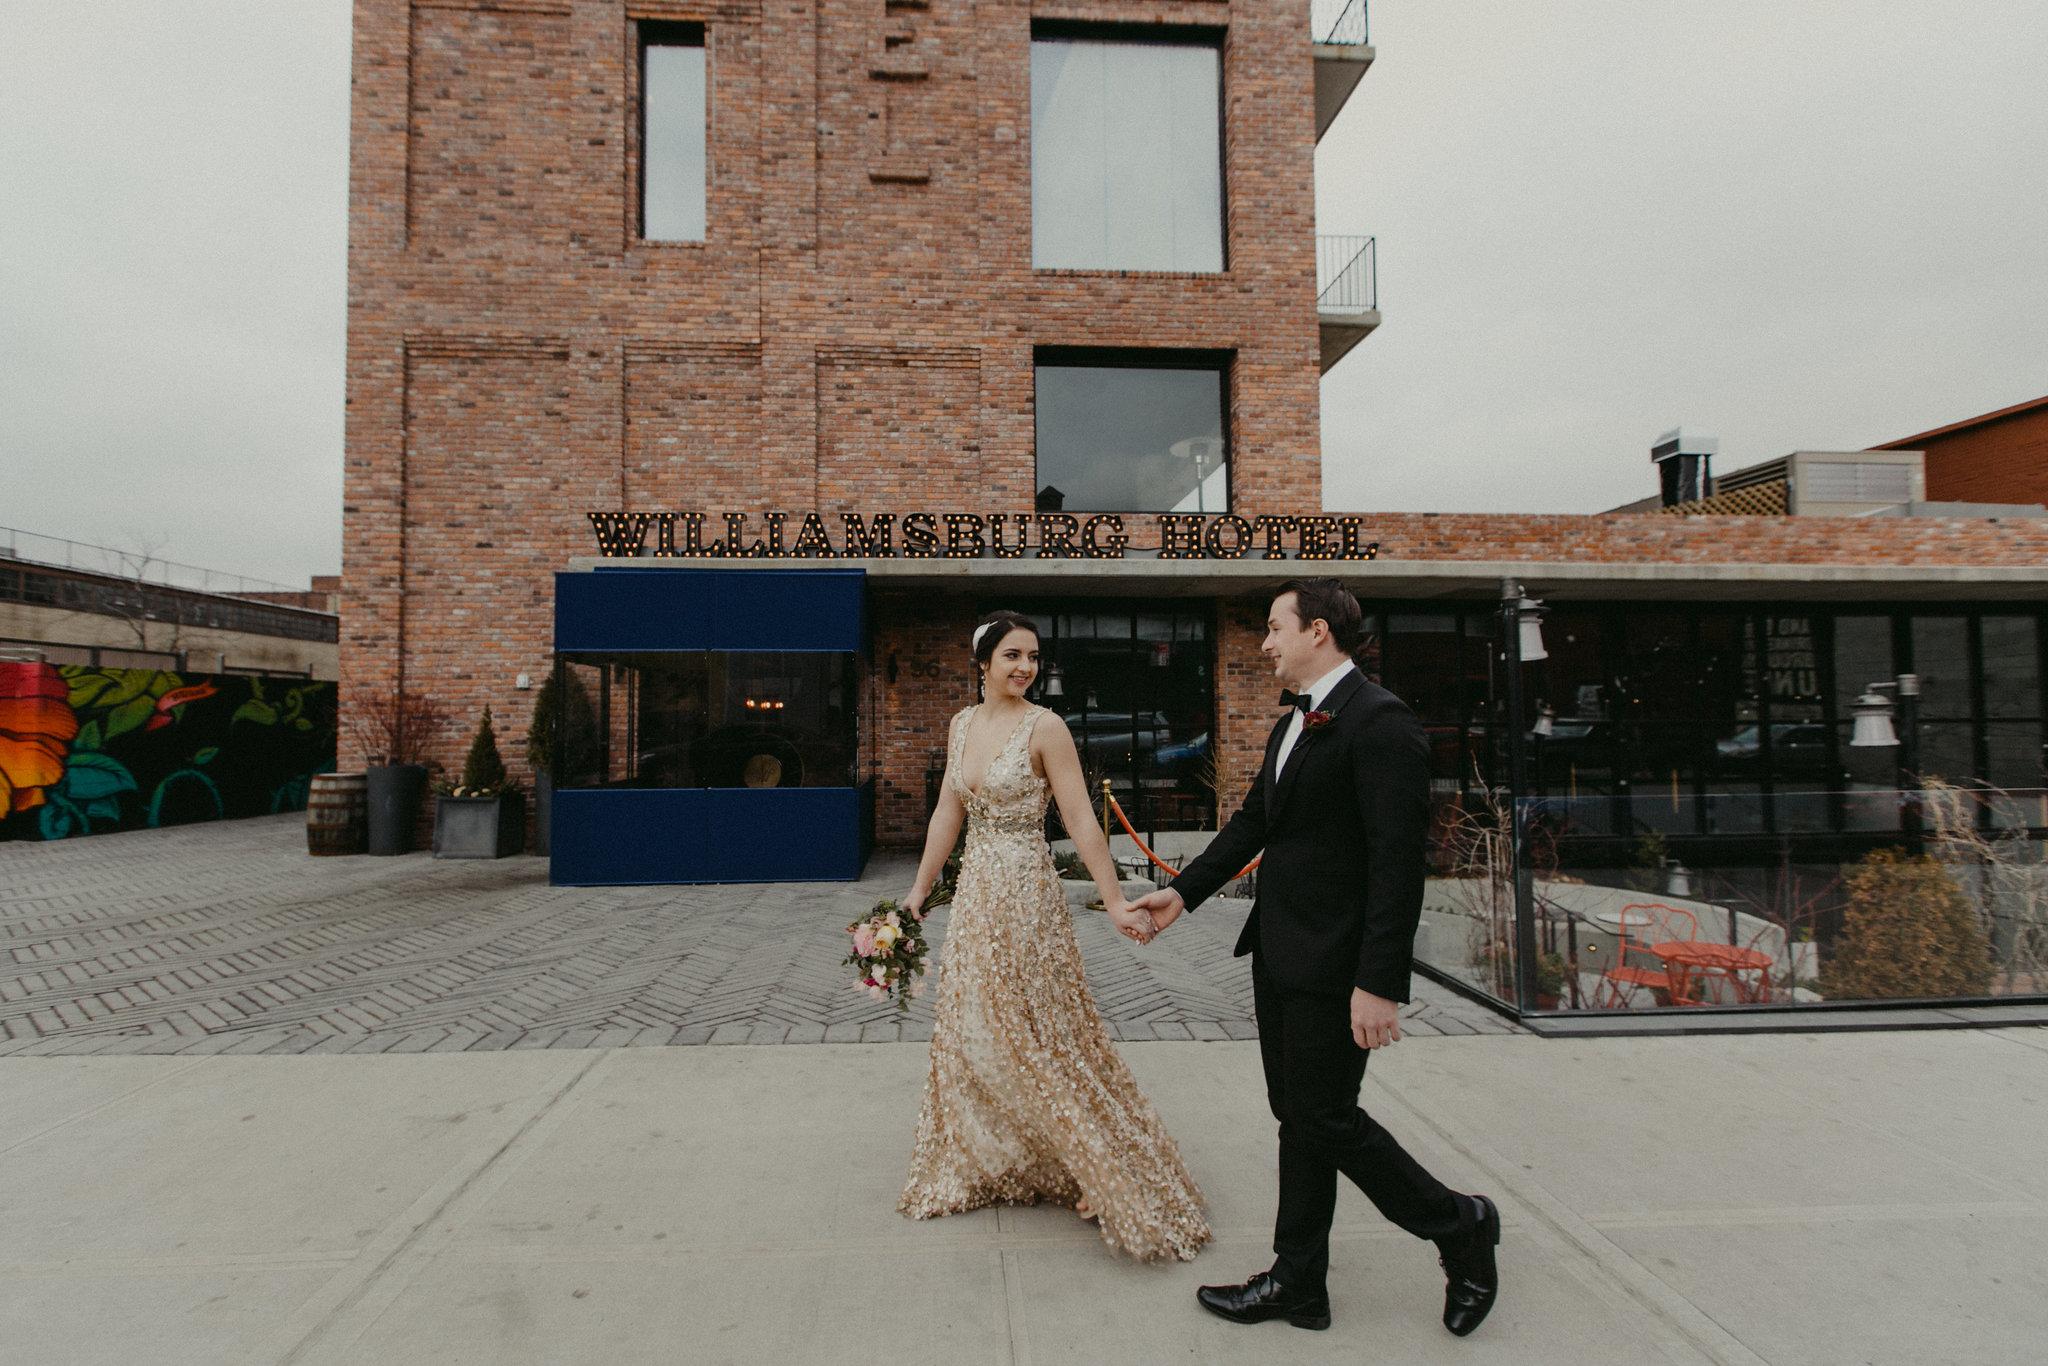 Williamsburg_Hotel_Wedding_Photographer_Chellise_Michael_Photography-196.jpg